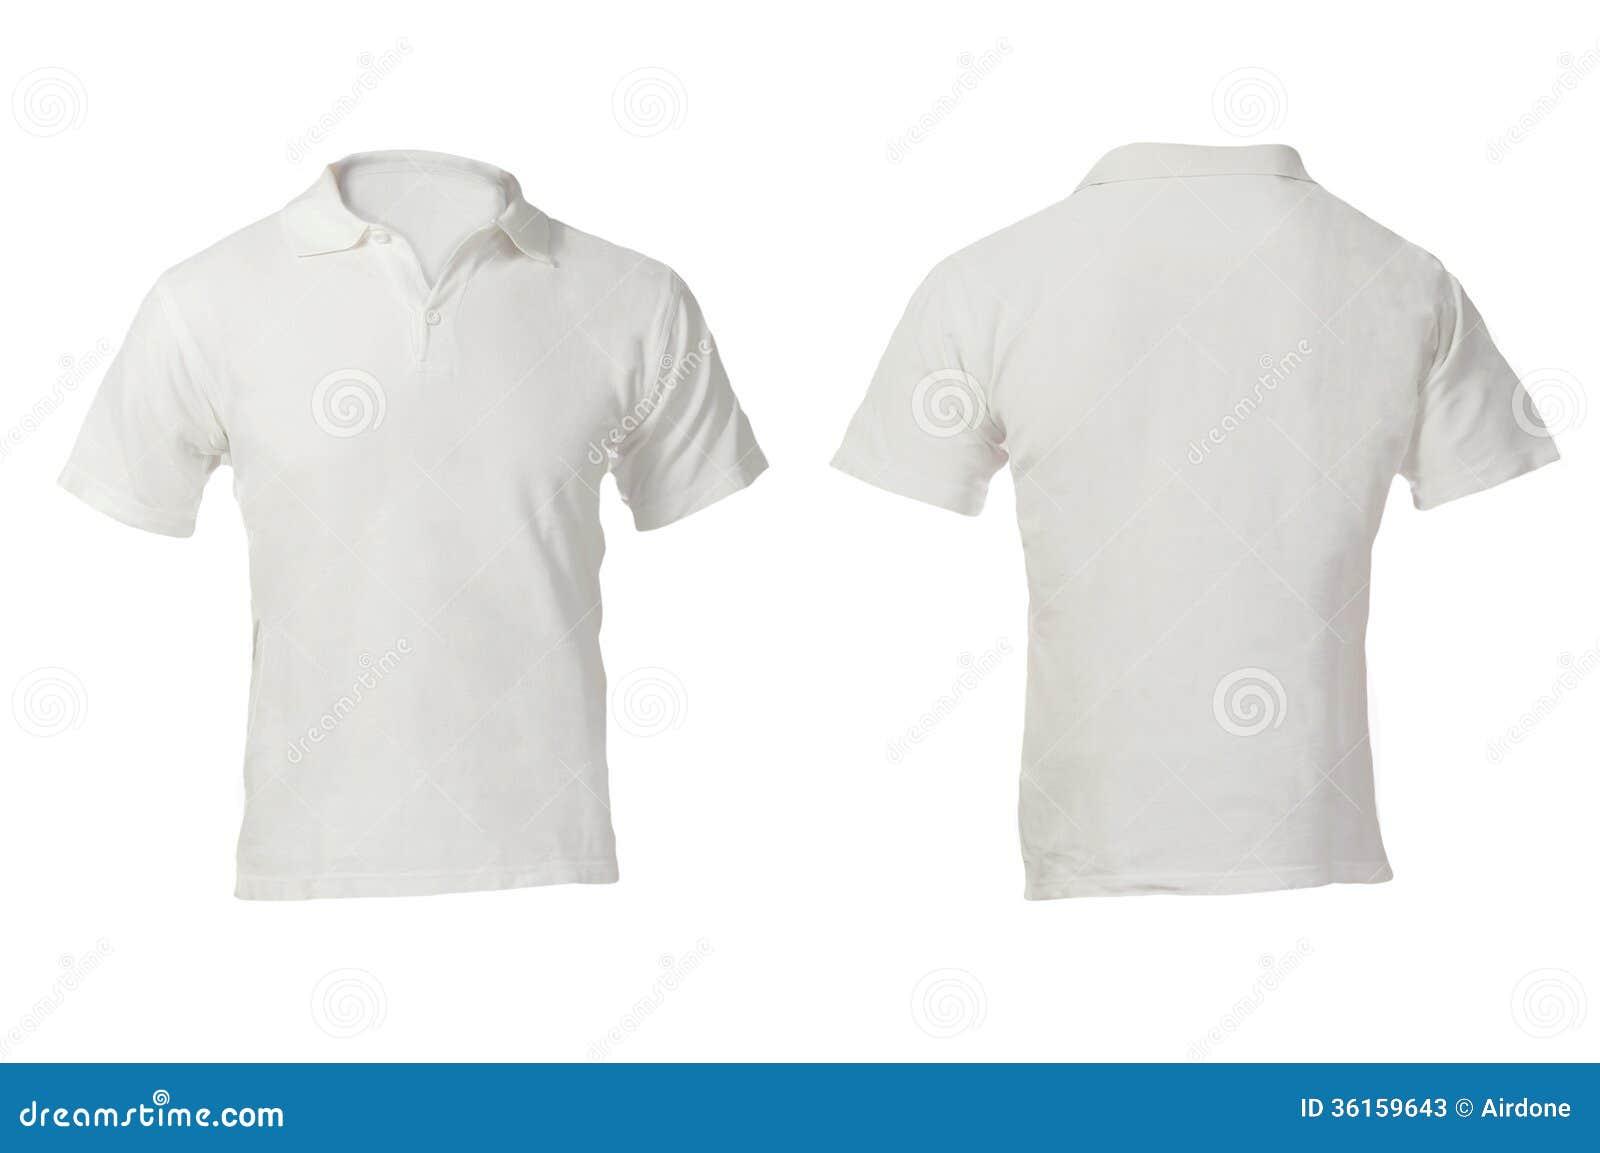 Men's Blank White Polo Shirt Template Stock Photos - Image: 36159643